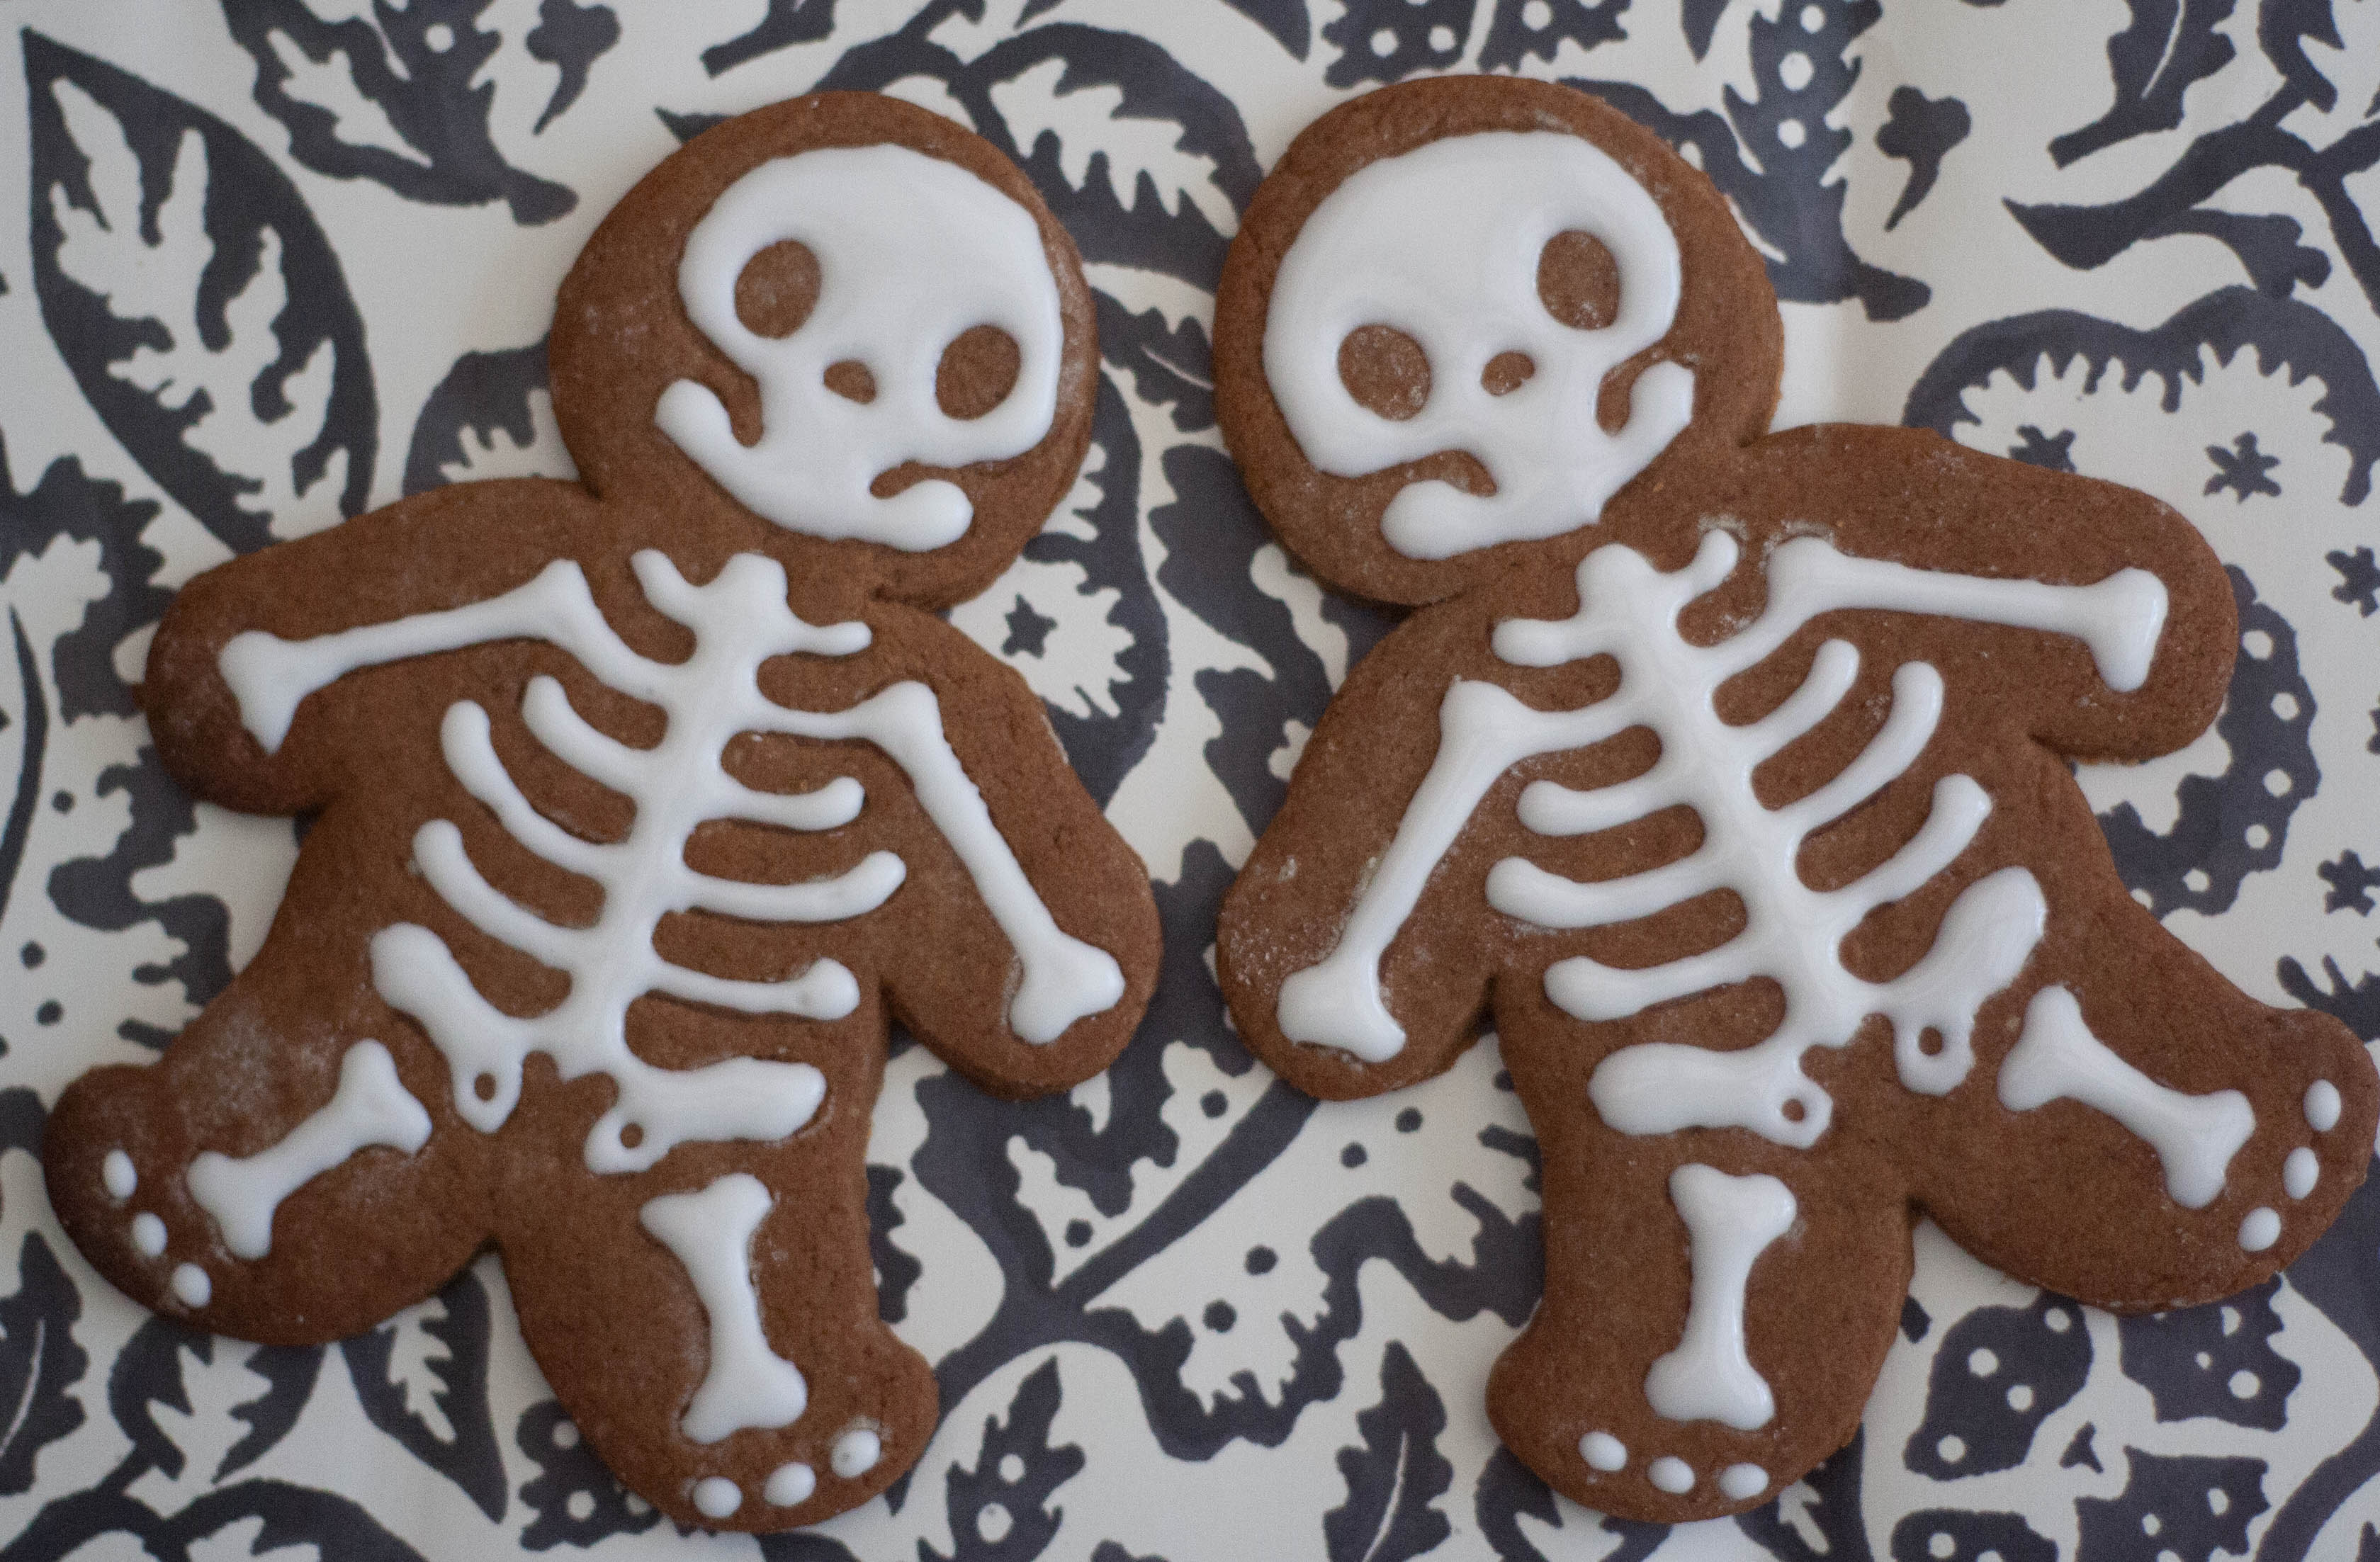 gingerbread skeletons vegan